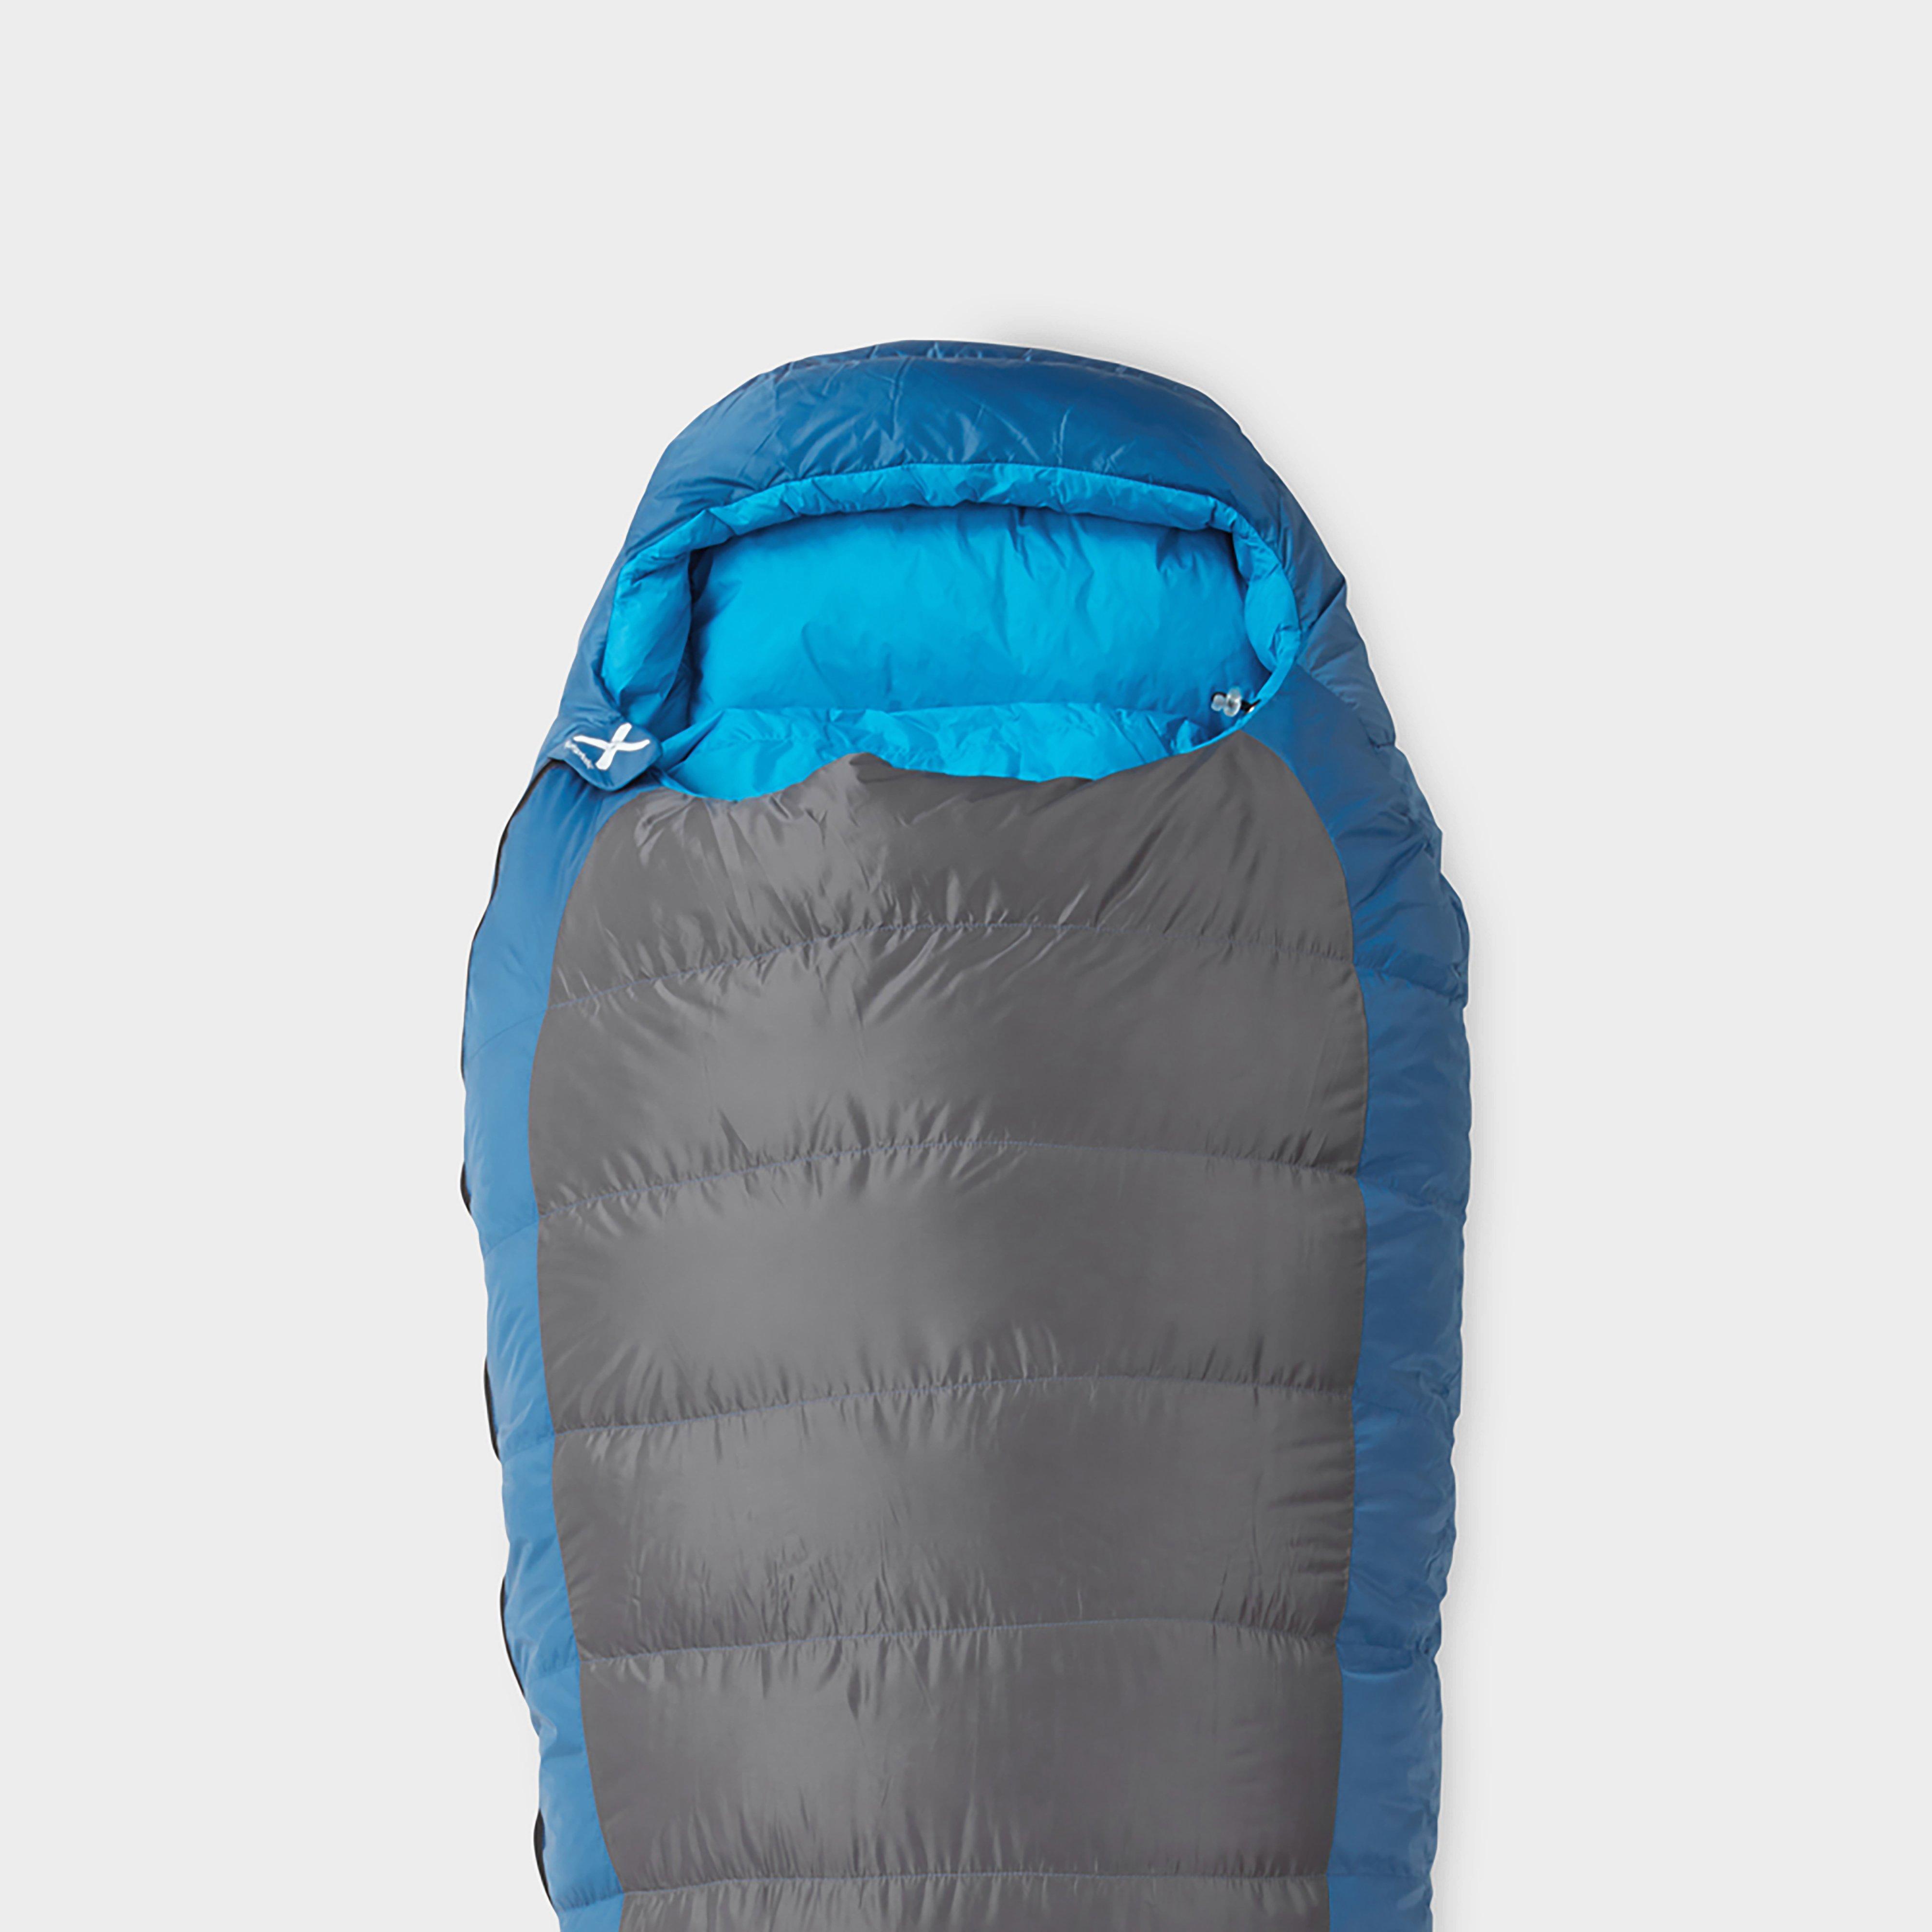 Oex Oex Somnus EV 600 Sleeping Bag - Blue, Blue